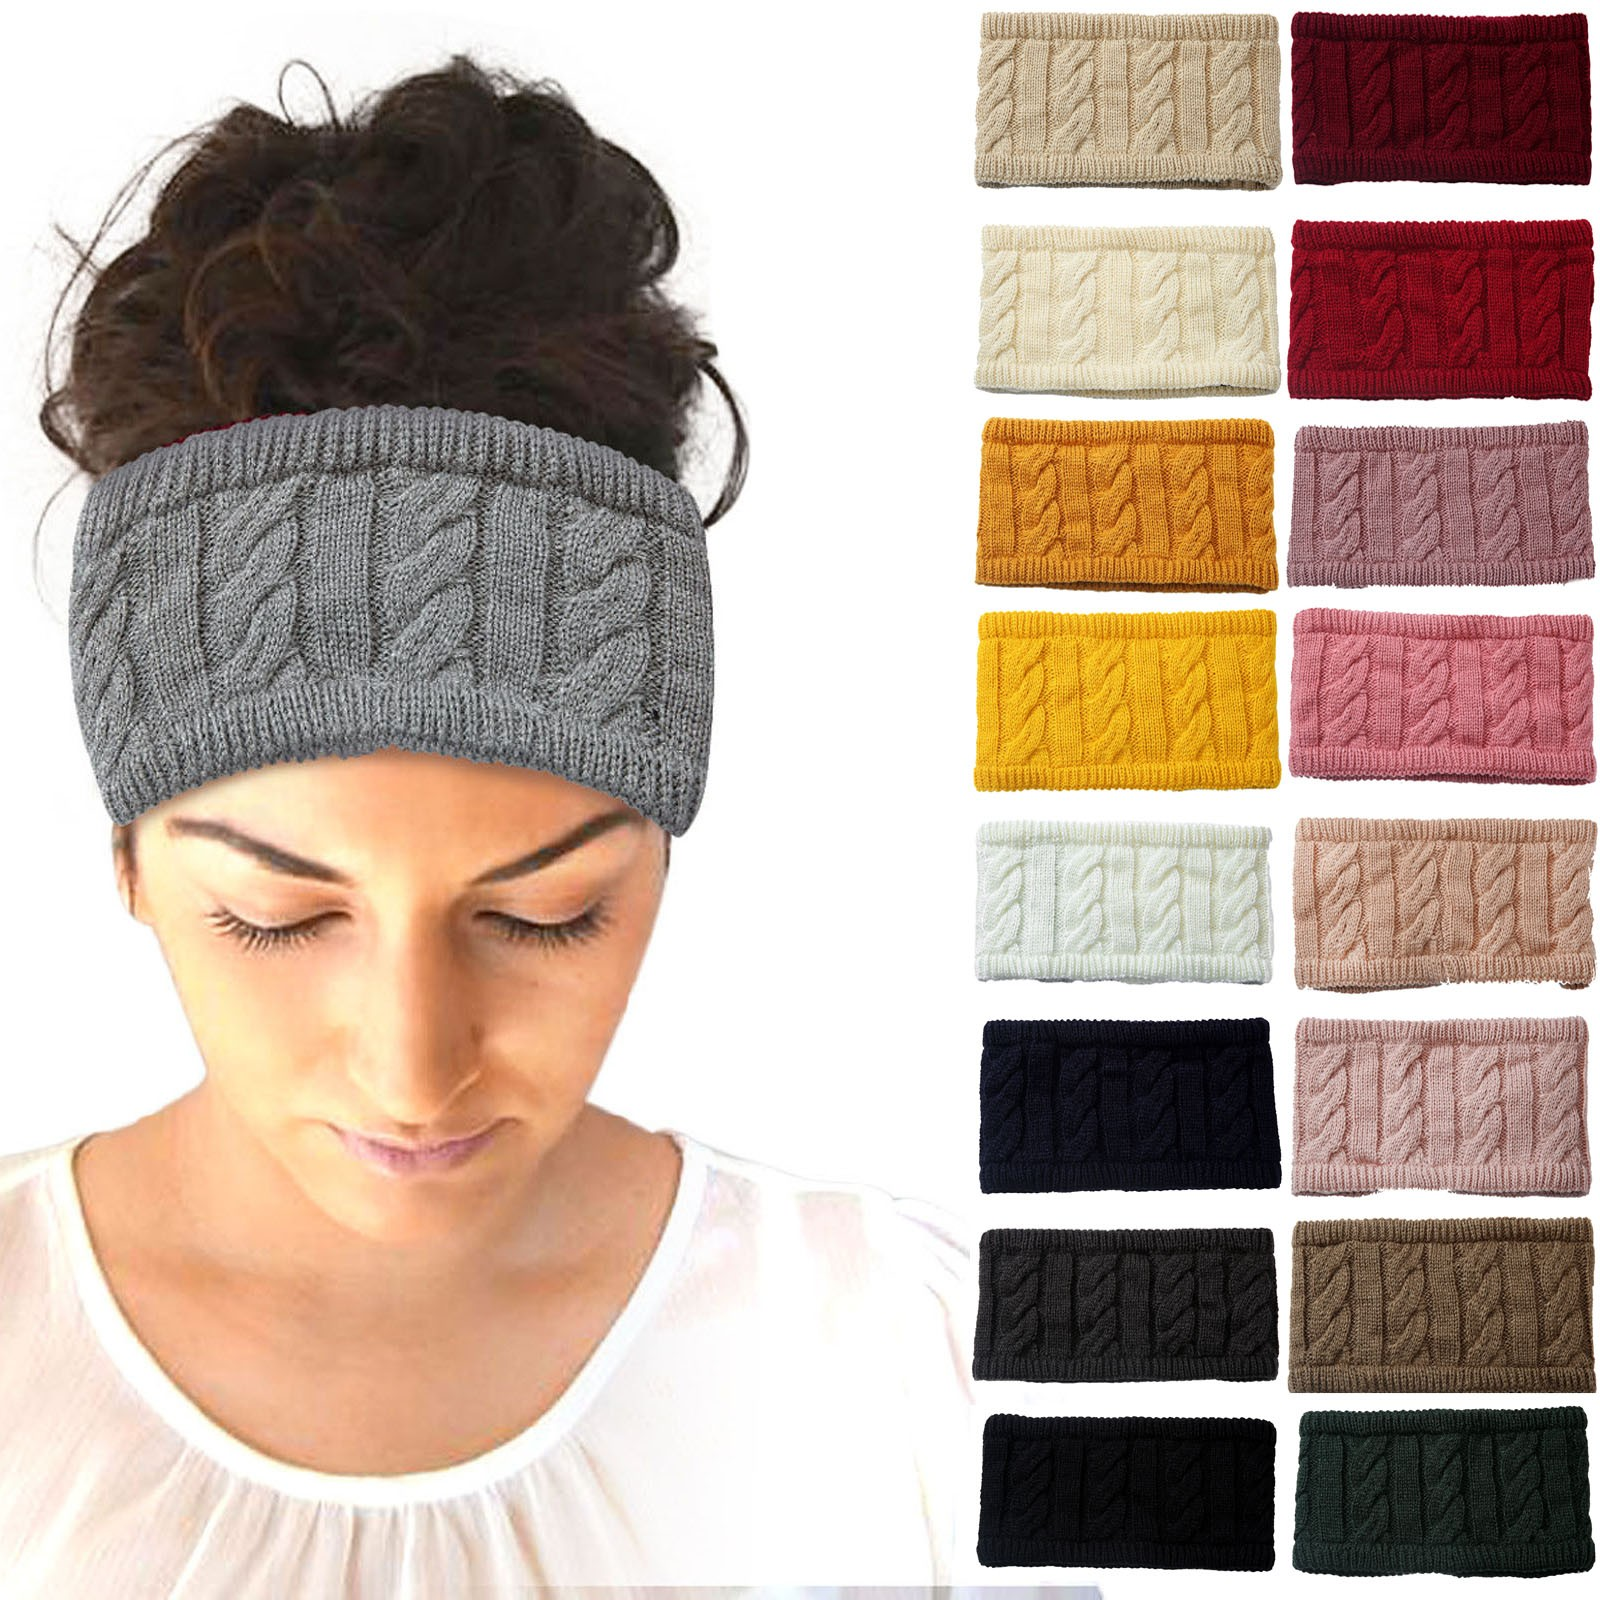 Winter Ear Warmer Headband Women Fashion Elastic Crochet Solid Knitted Headband Head Wrap Hairband Girls Hair Band Accessories